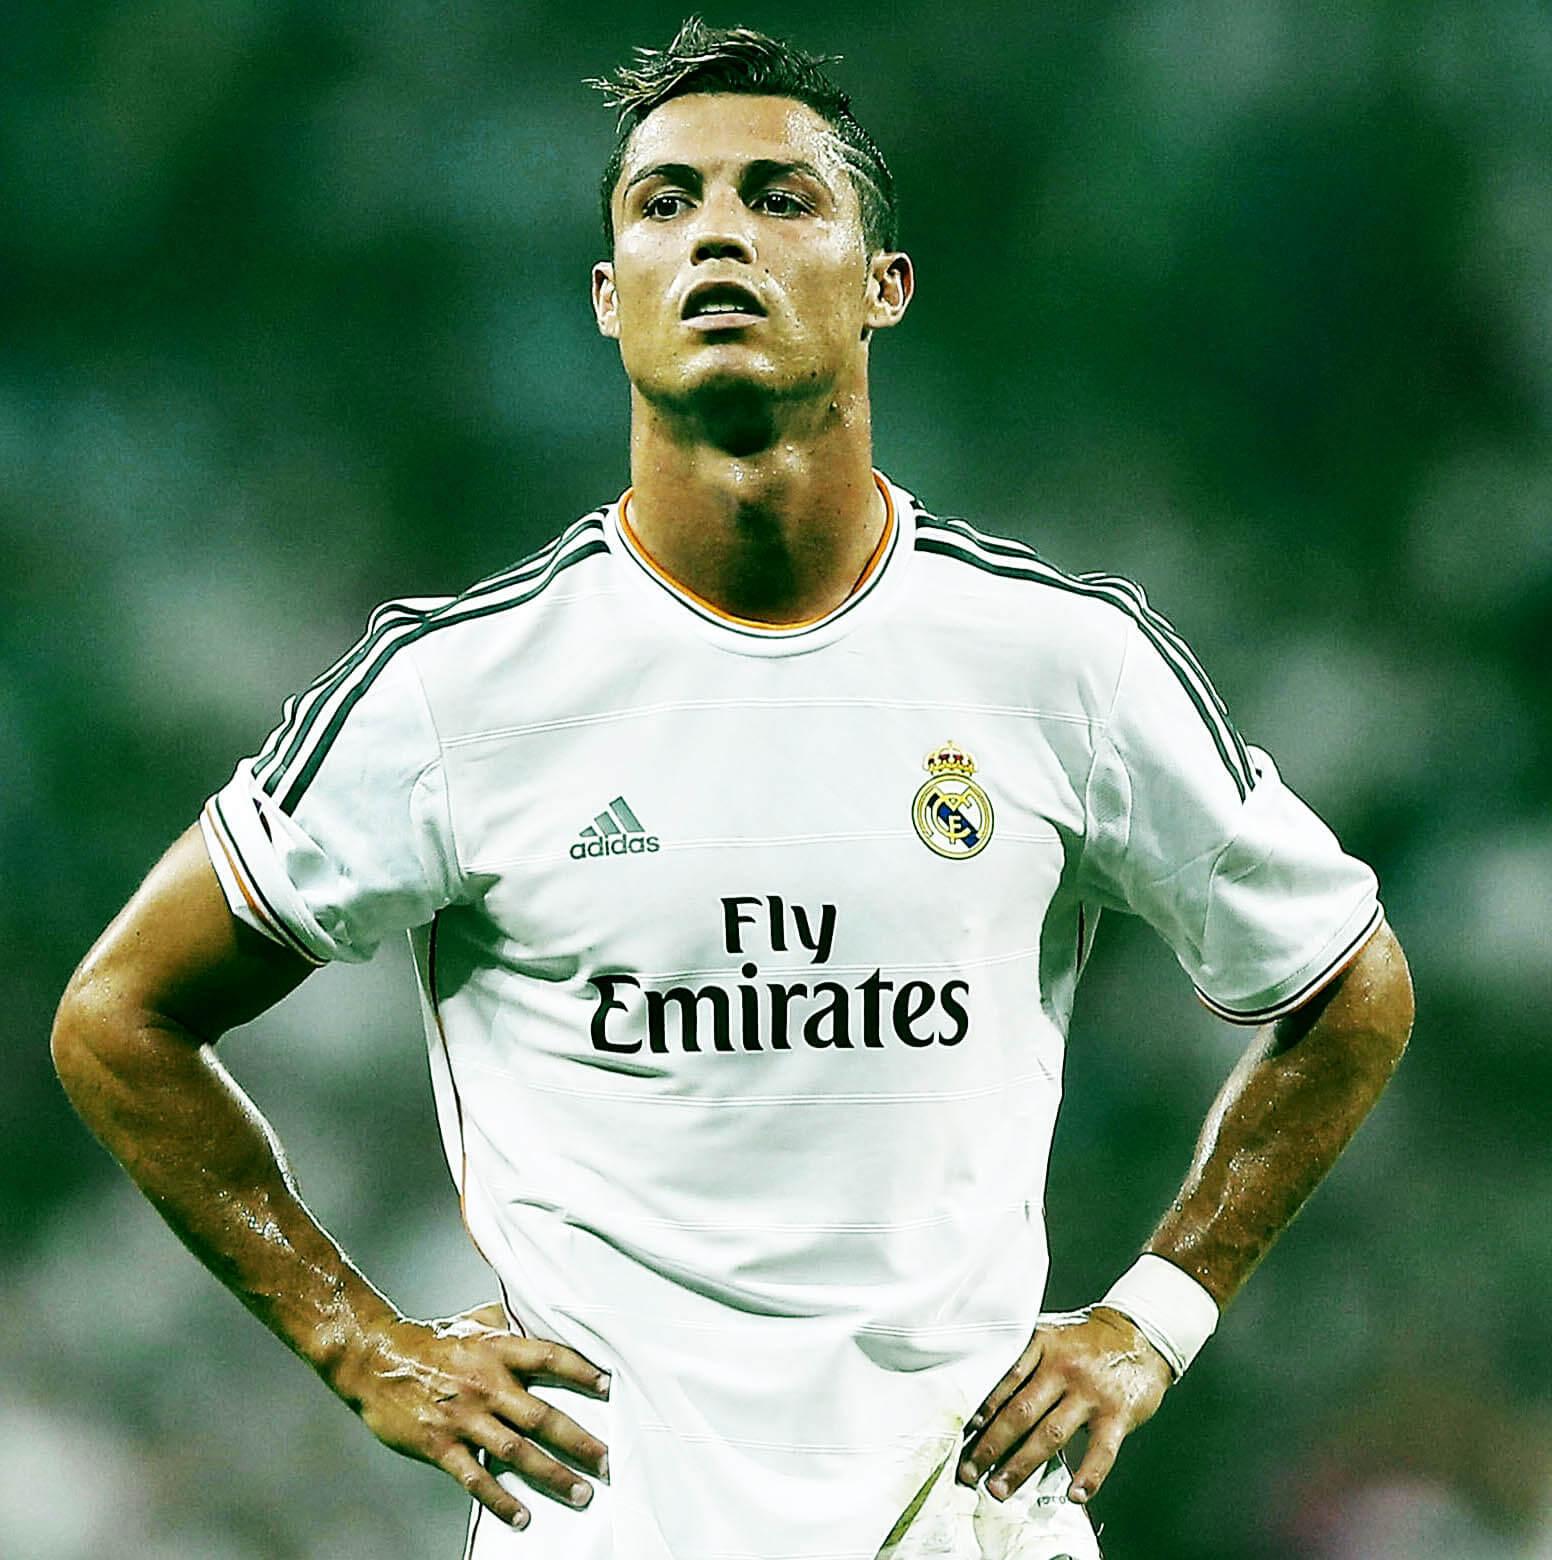 Cristiano Ronaldo Wallpaper: Real Madrid 2015 Best HD Wallpapers For Desktop, Mobile